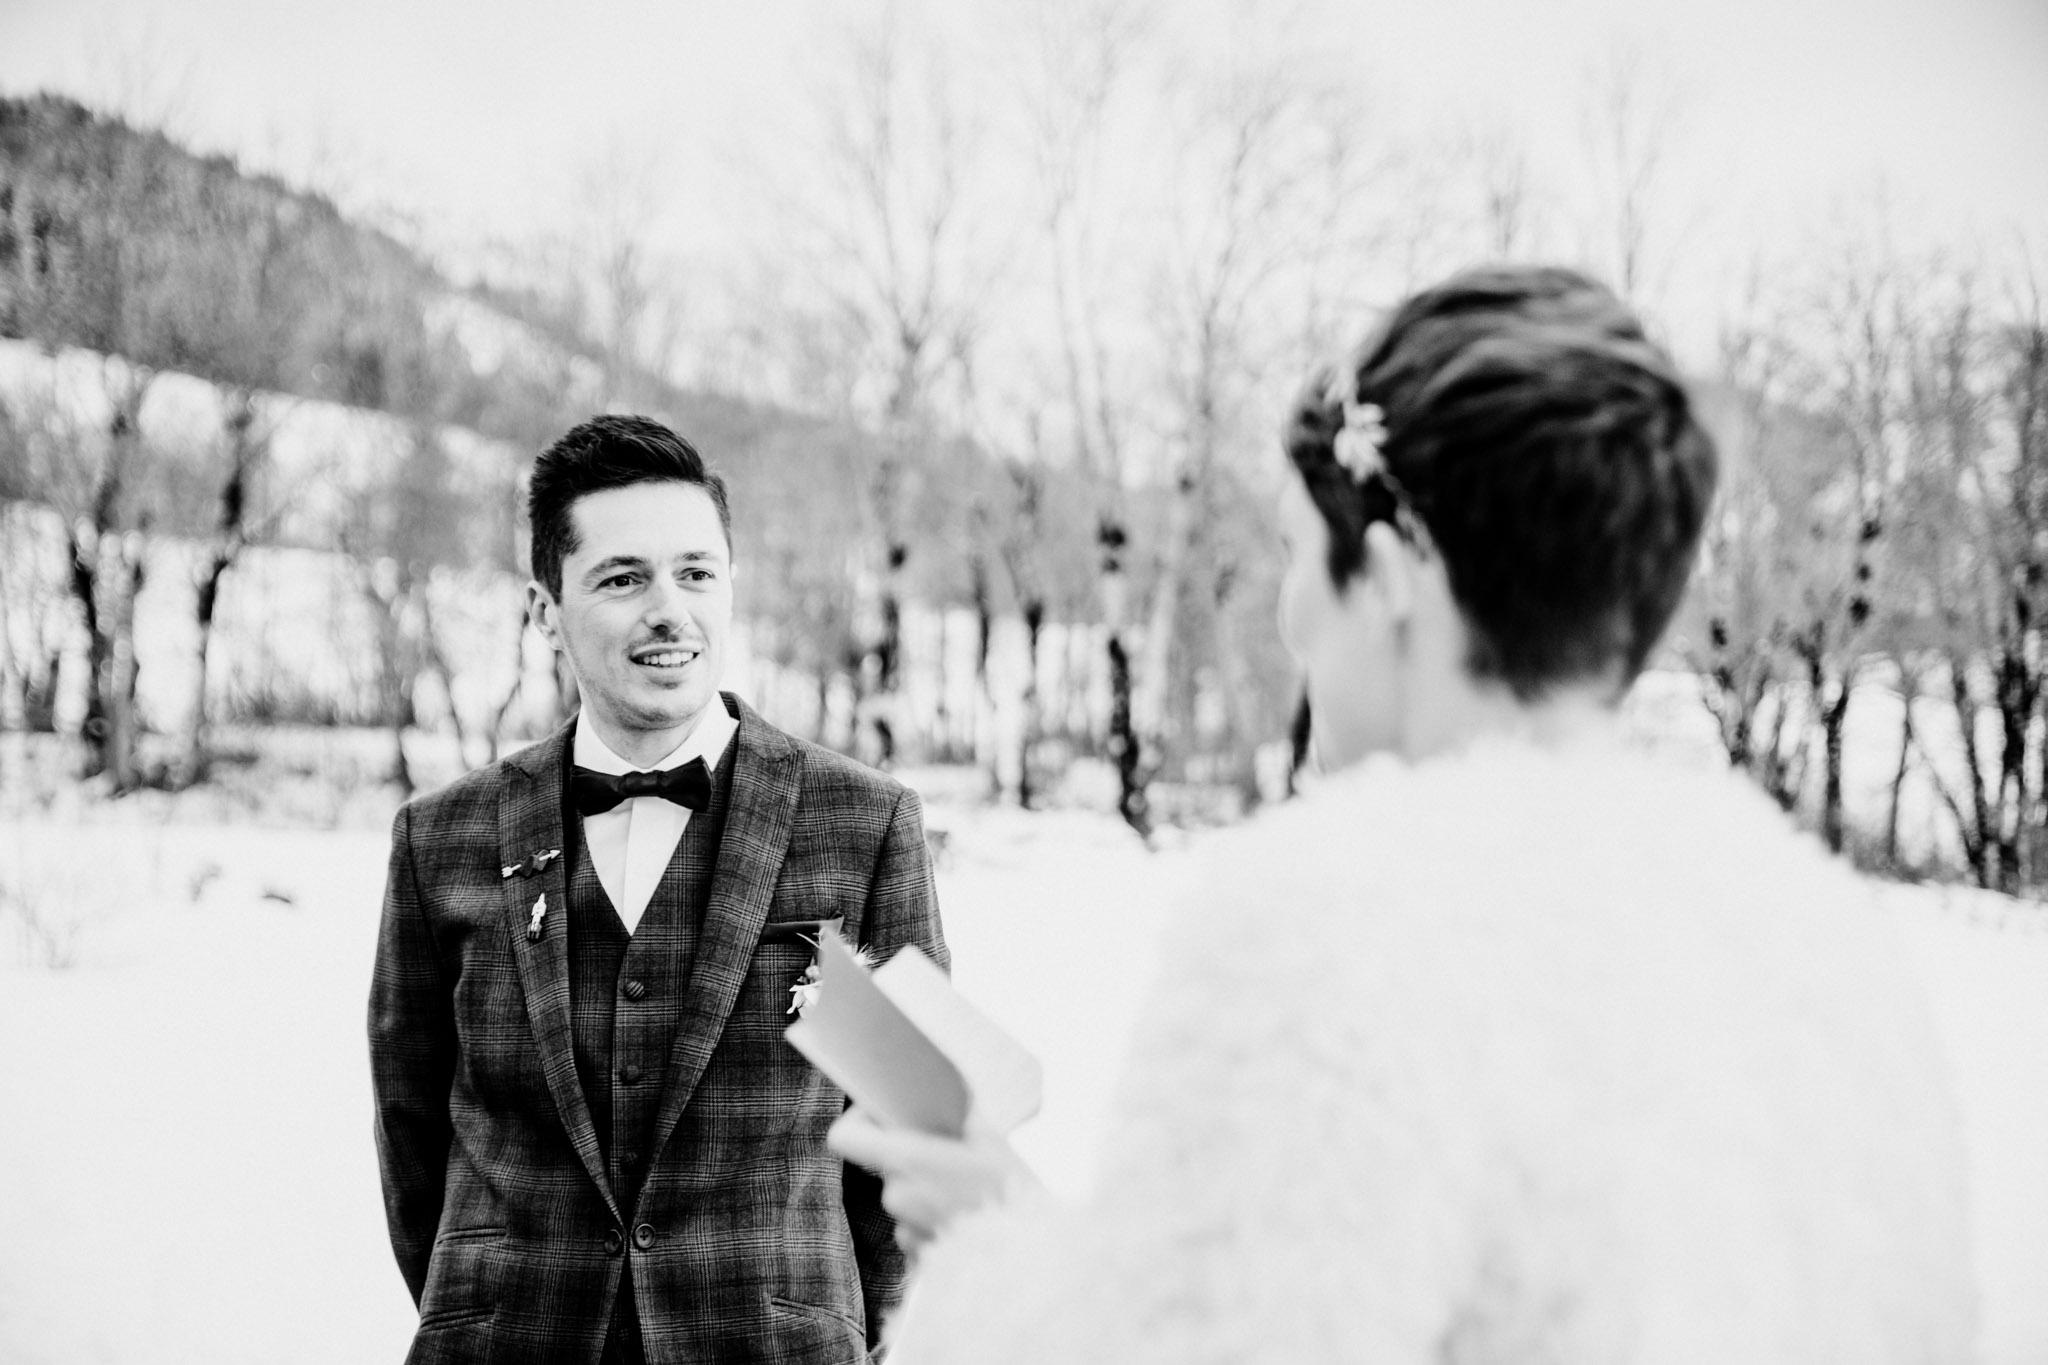 2018-02-03 - LD8_4990 - photographe - mariage - www.lauriediazwedding.com.jpg